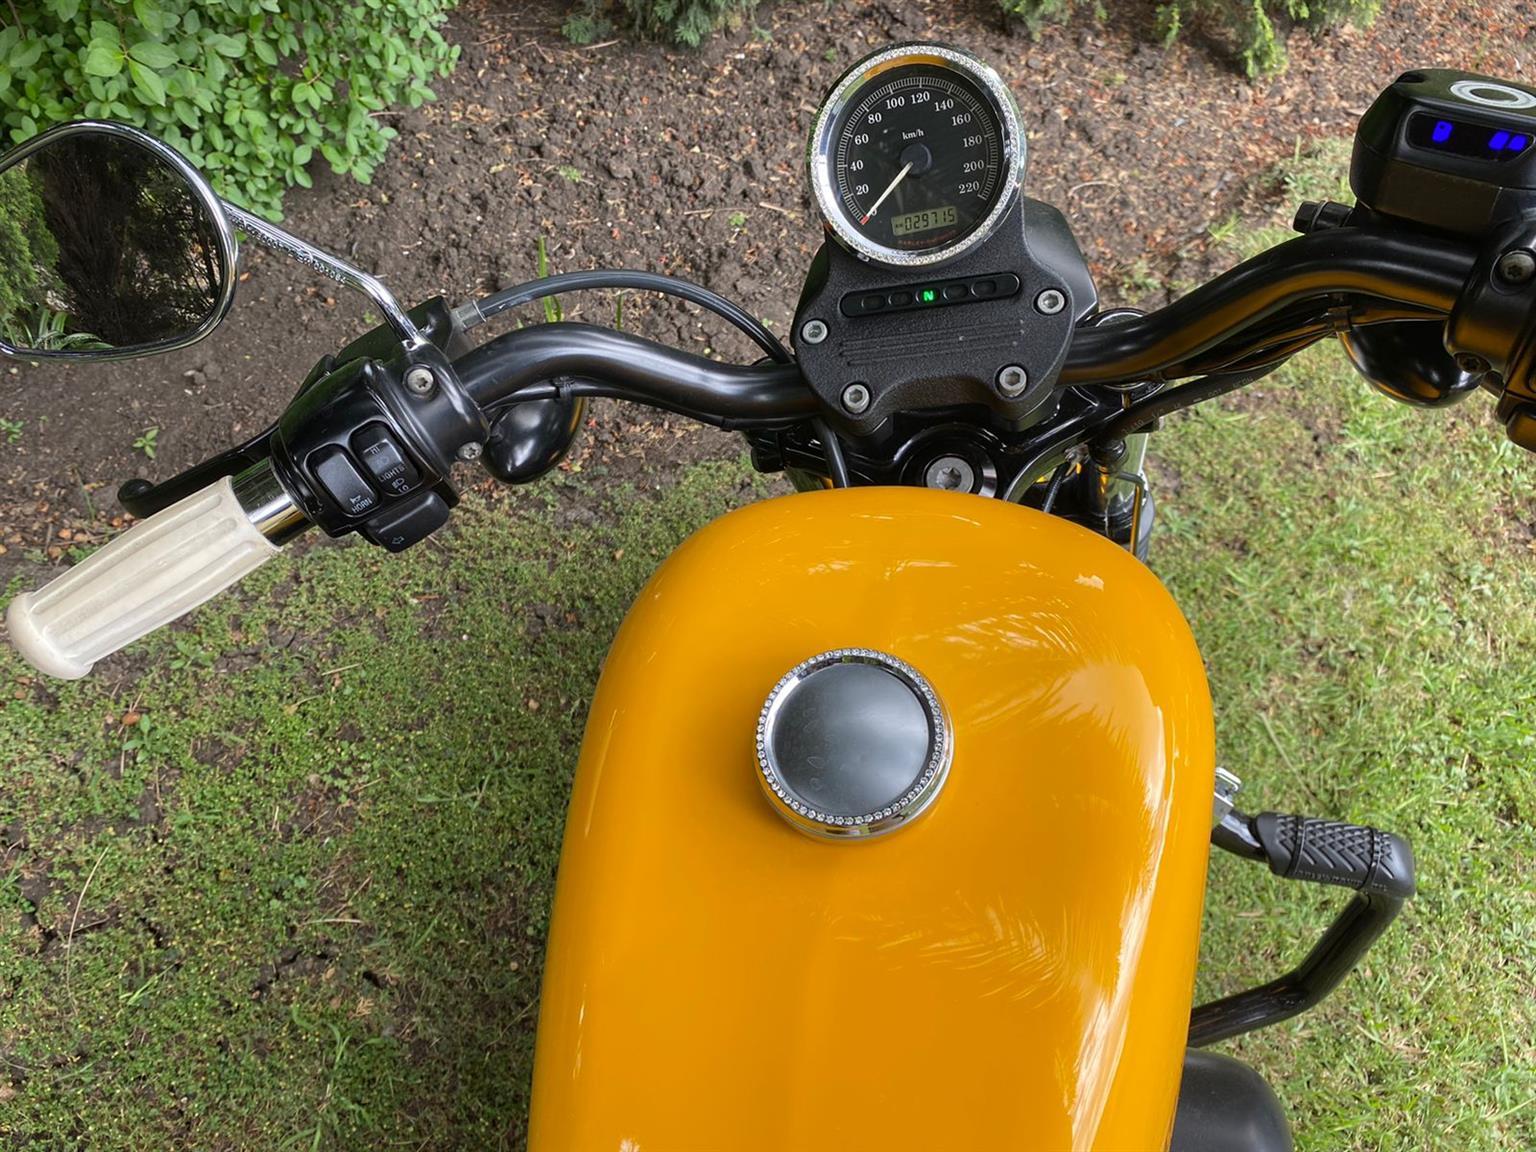 Harley Davidson Sportster 883 - 2011